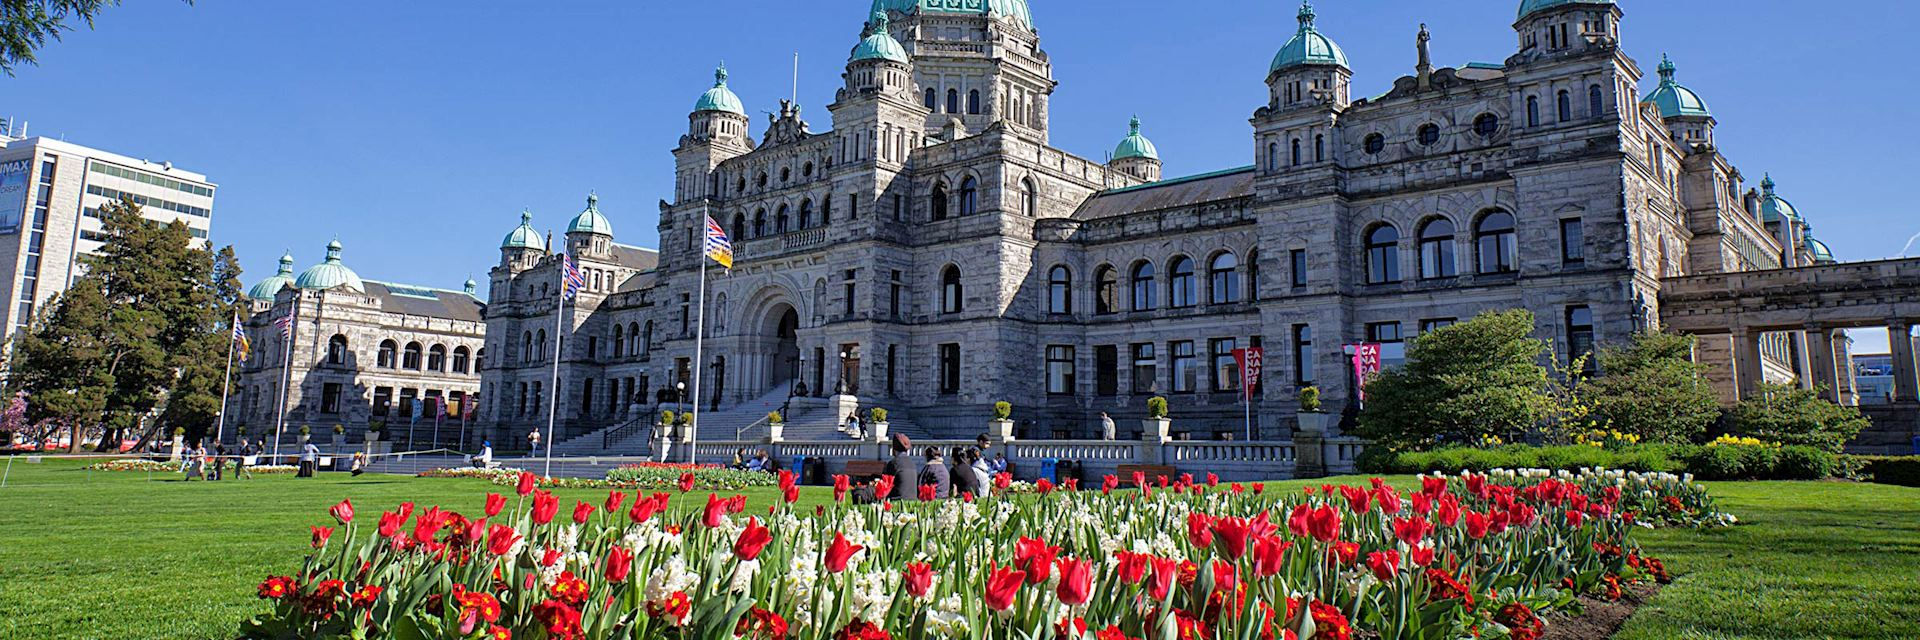 Parliament Building, Victoria